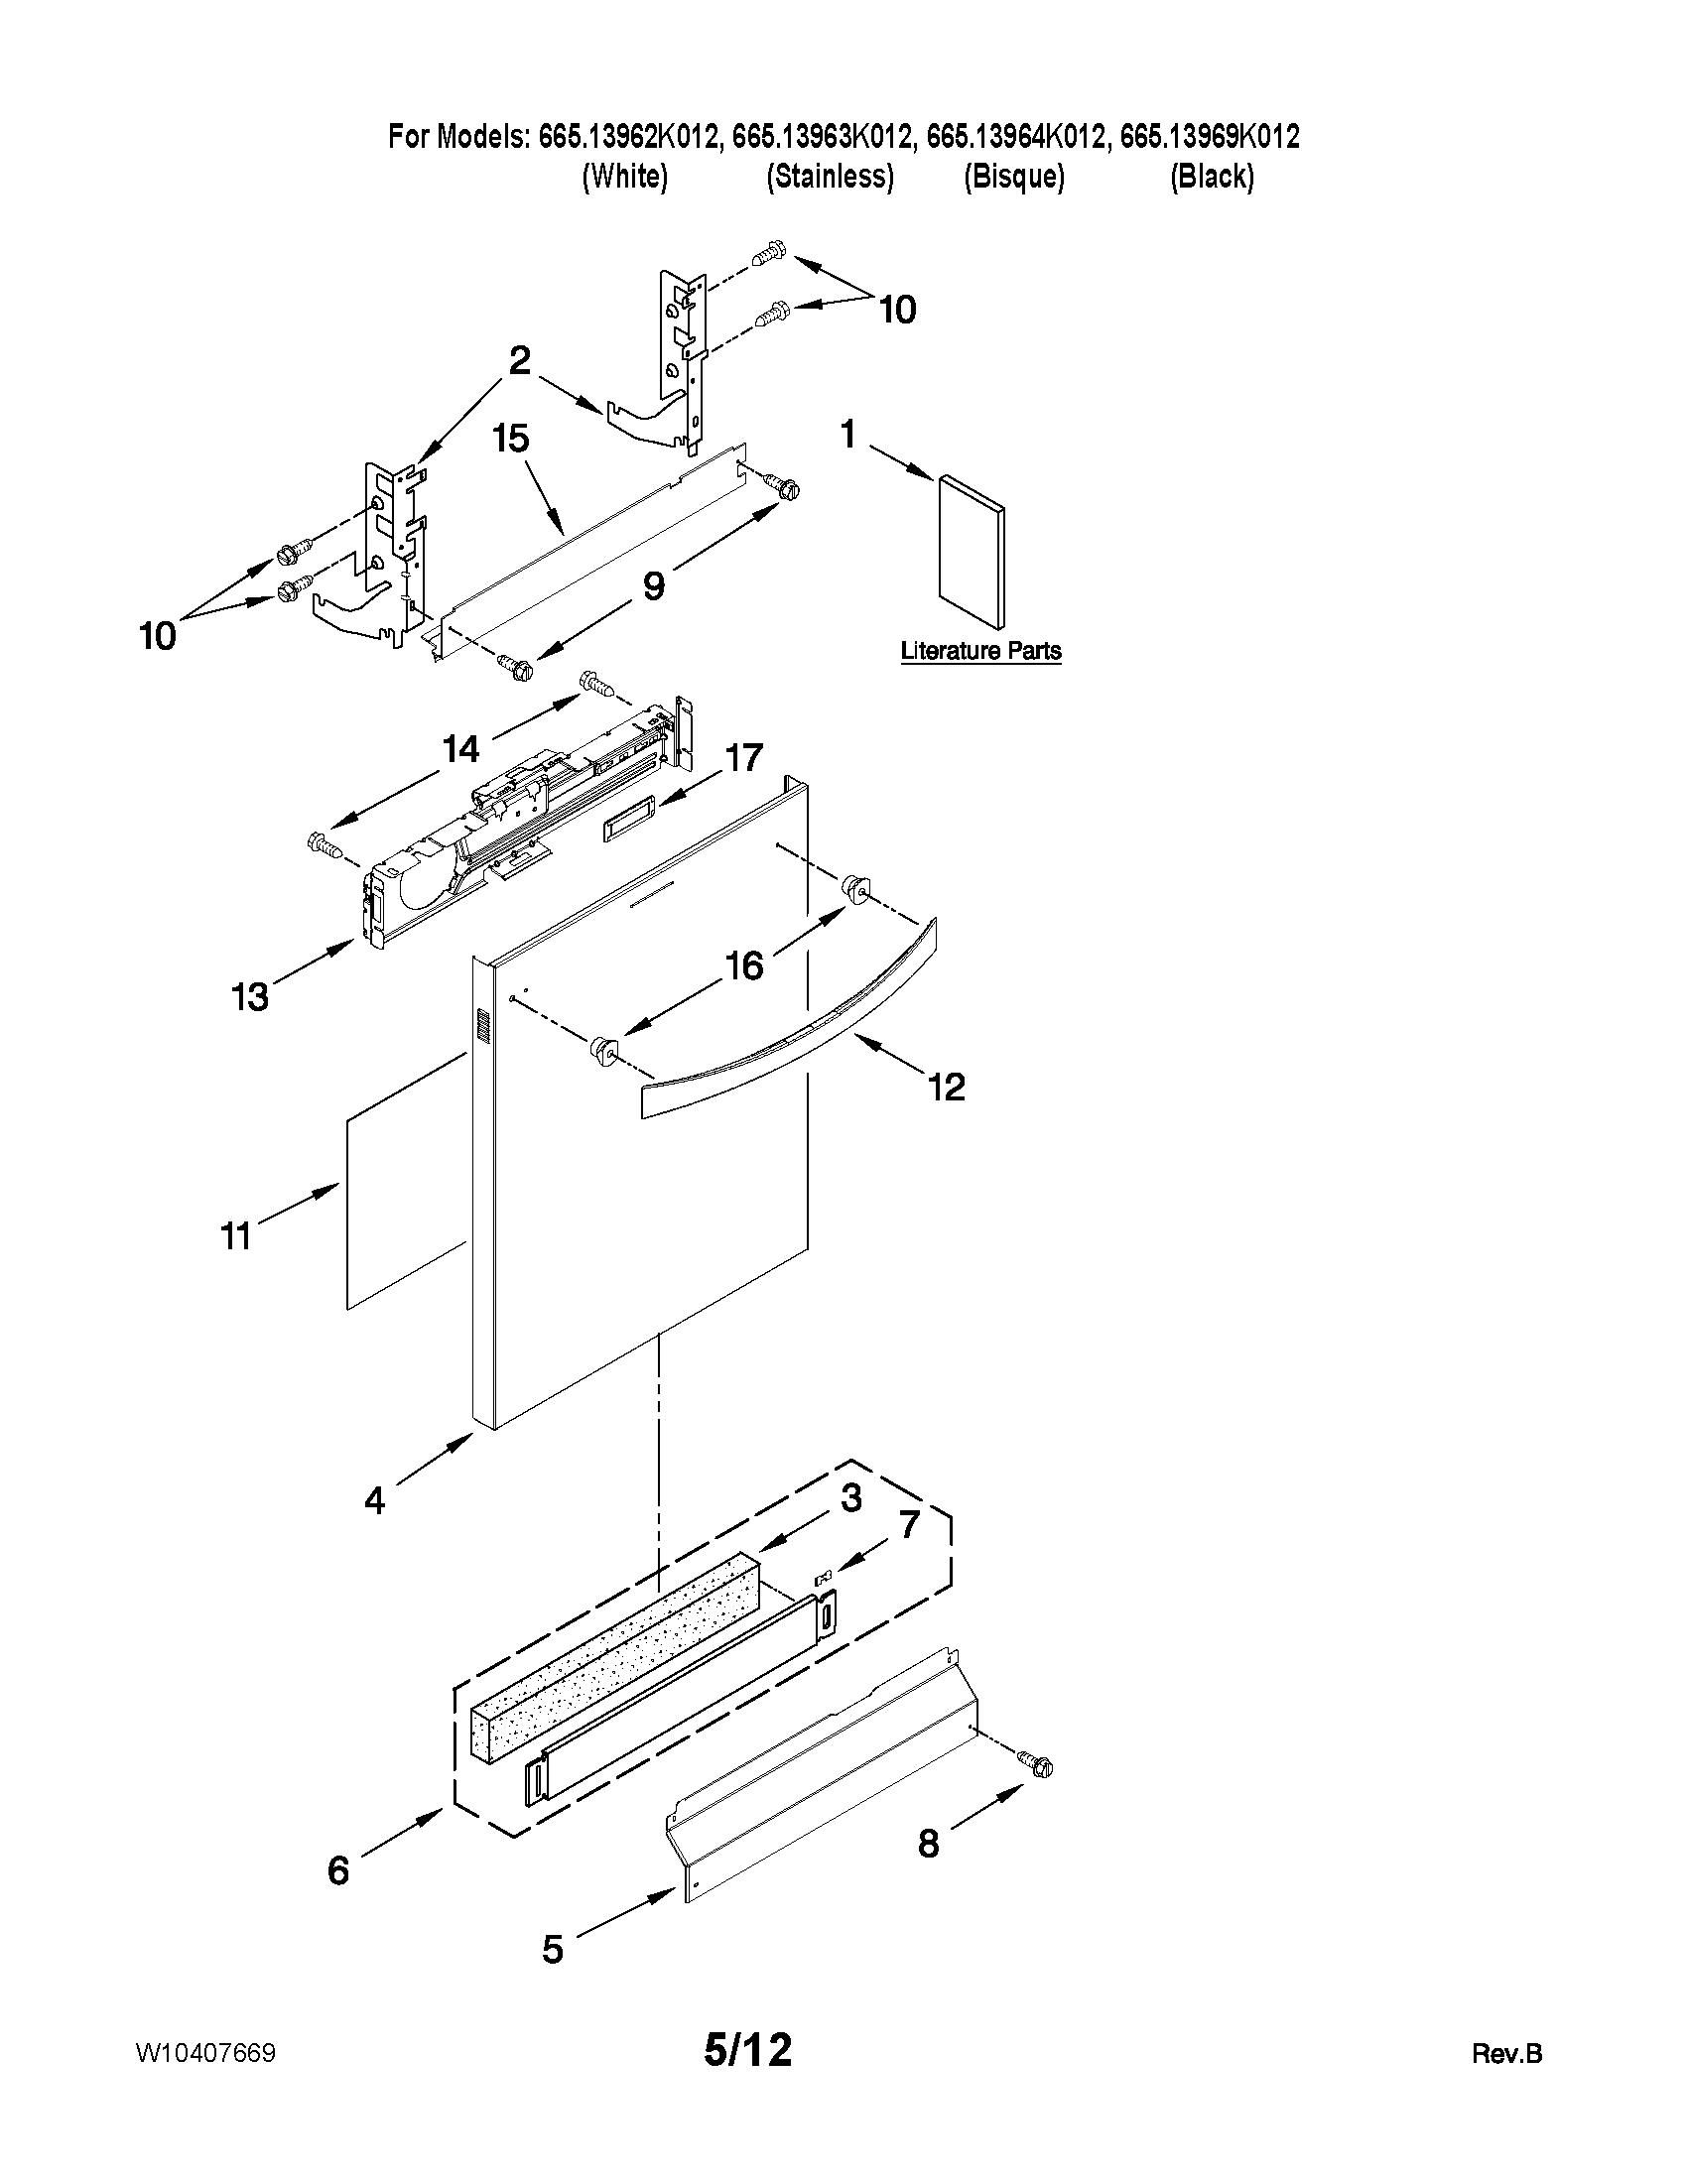 kenmore elite dishwasher wiring diagram 1991 ford f150 starter solenoid undercounter parts model